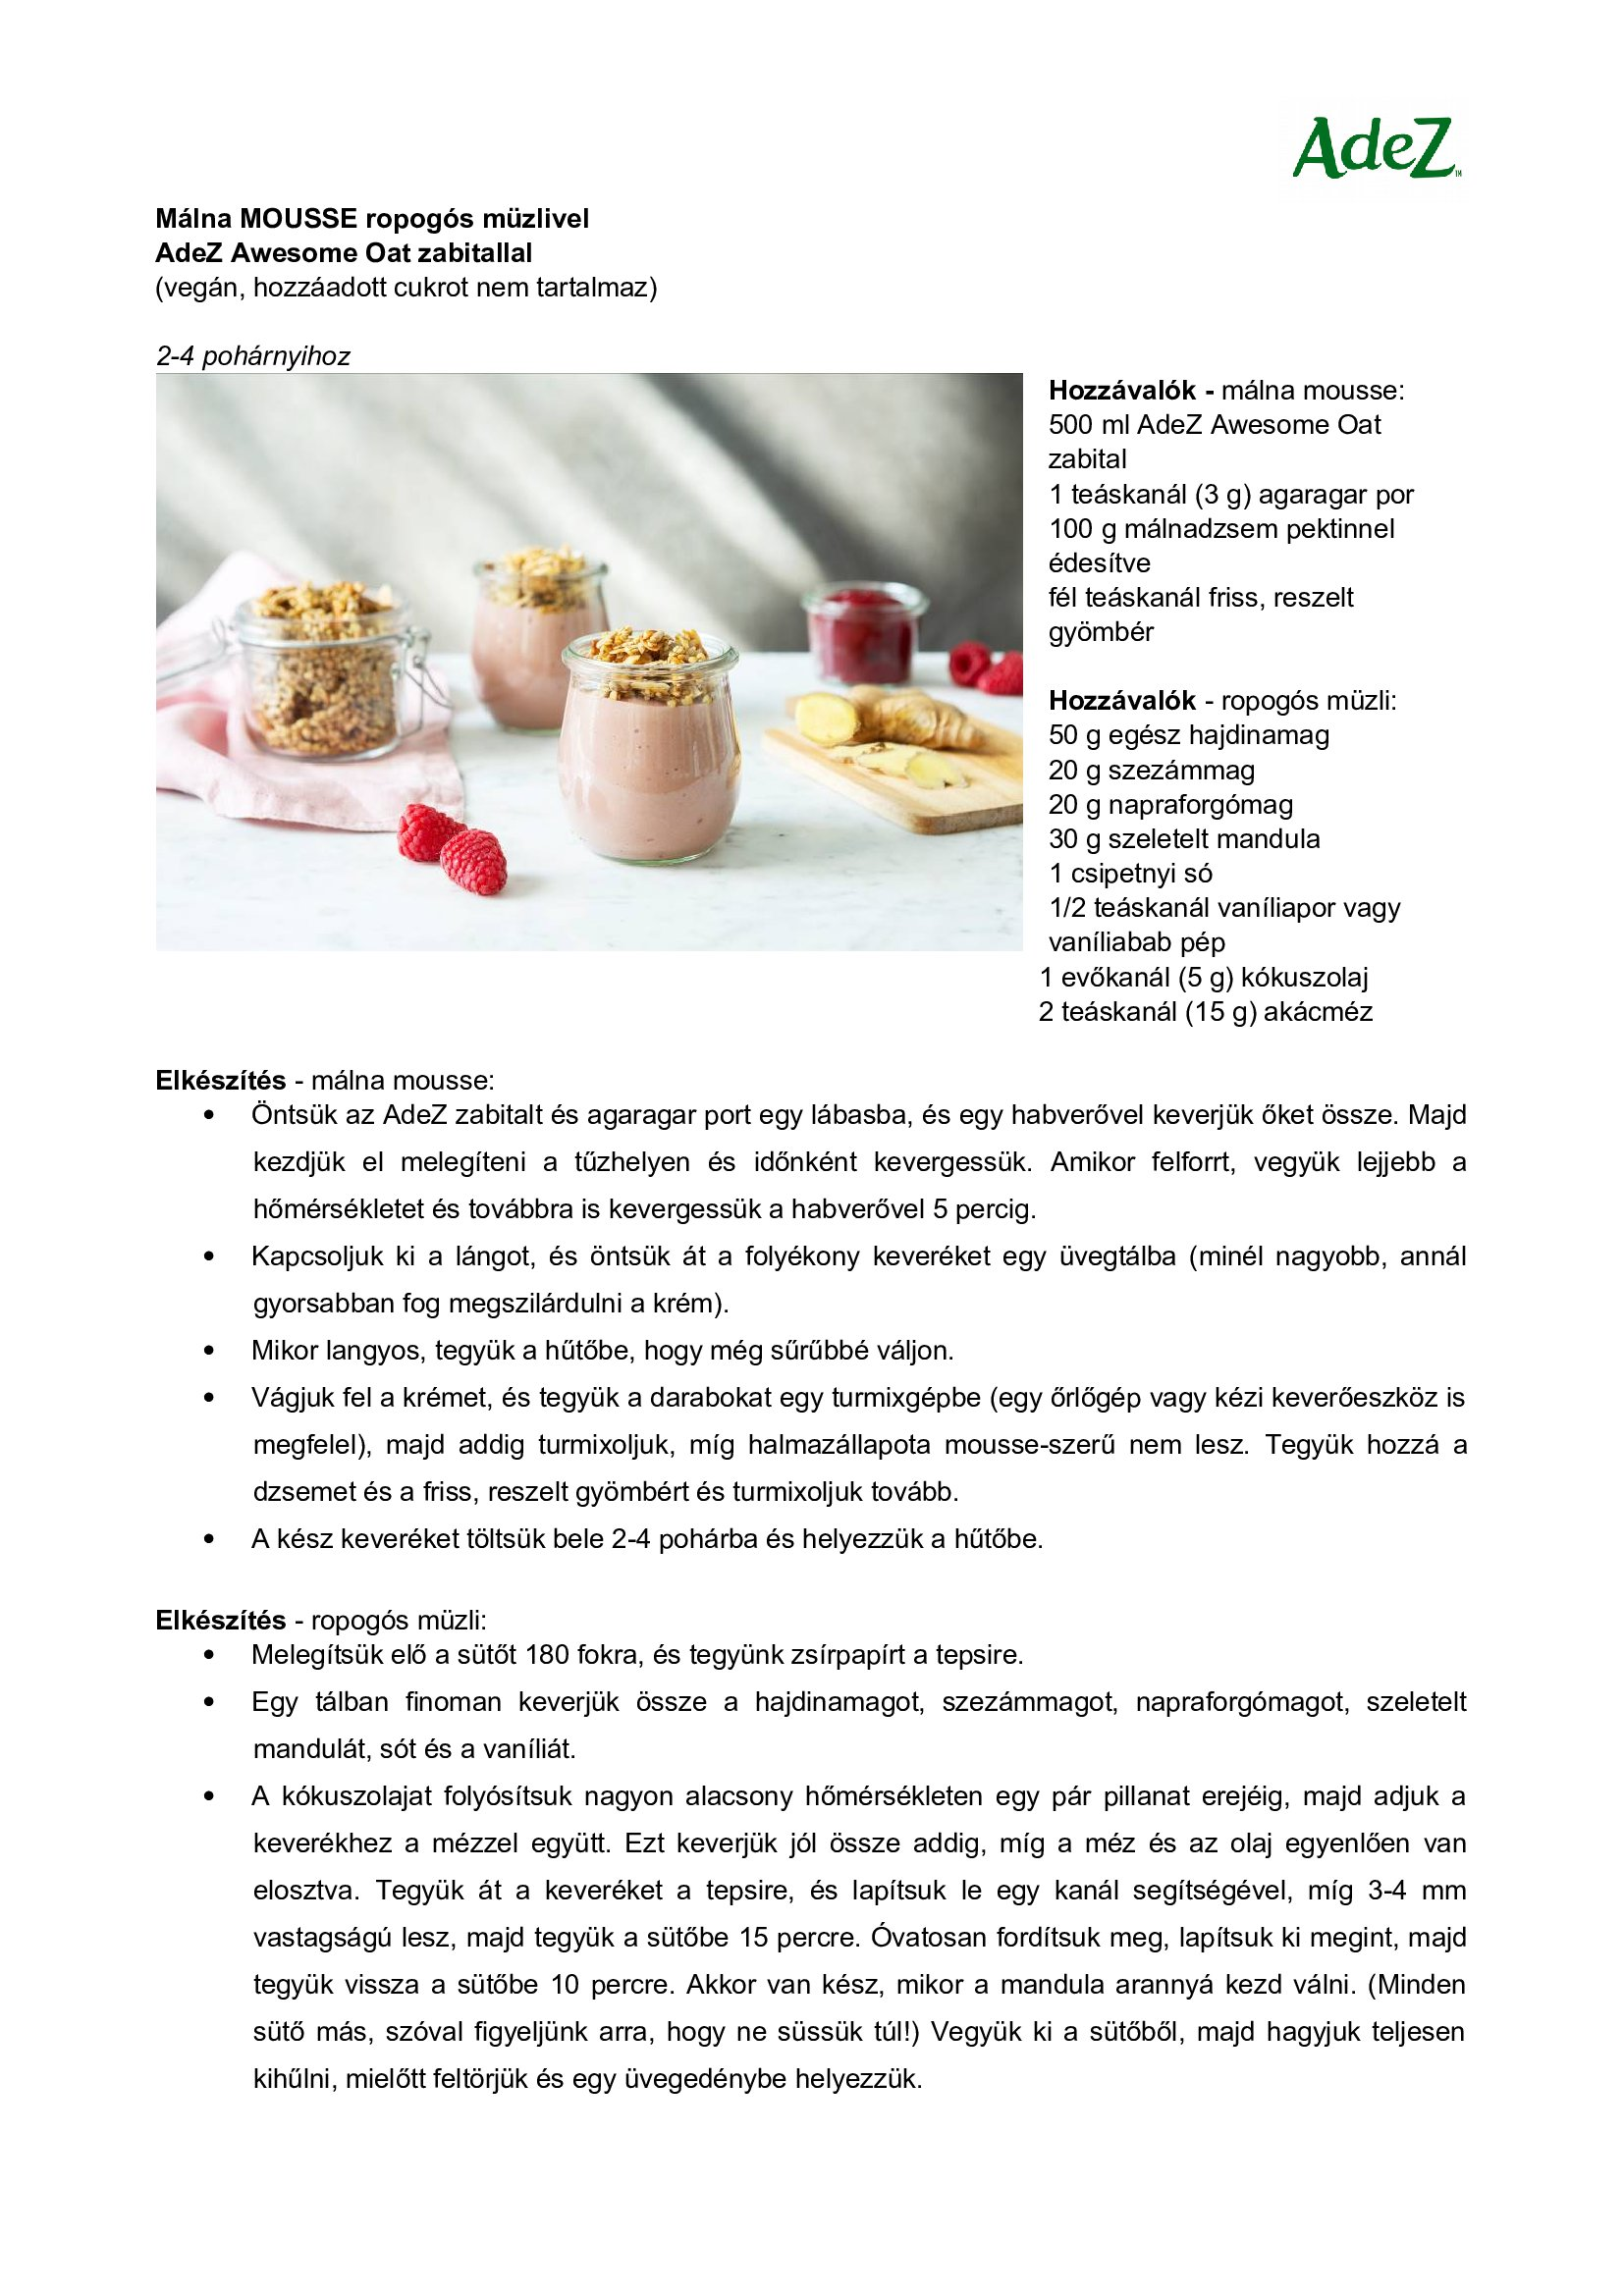 adez_ban_nkeny_r_muffin_smoothie_receptek_004.jpg